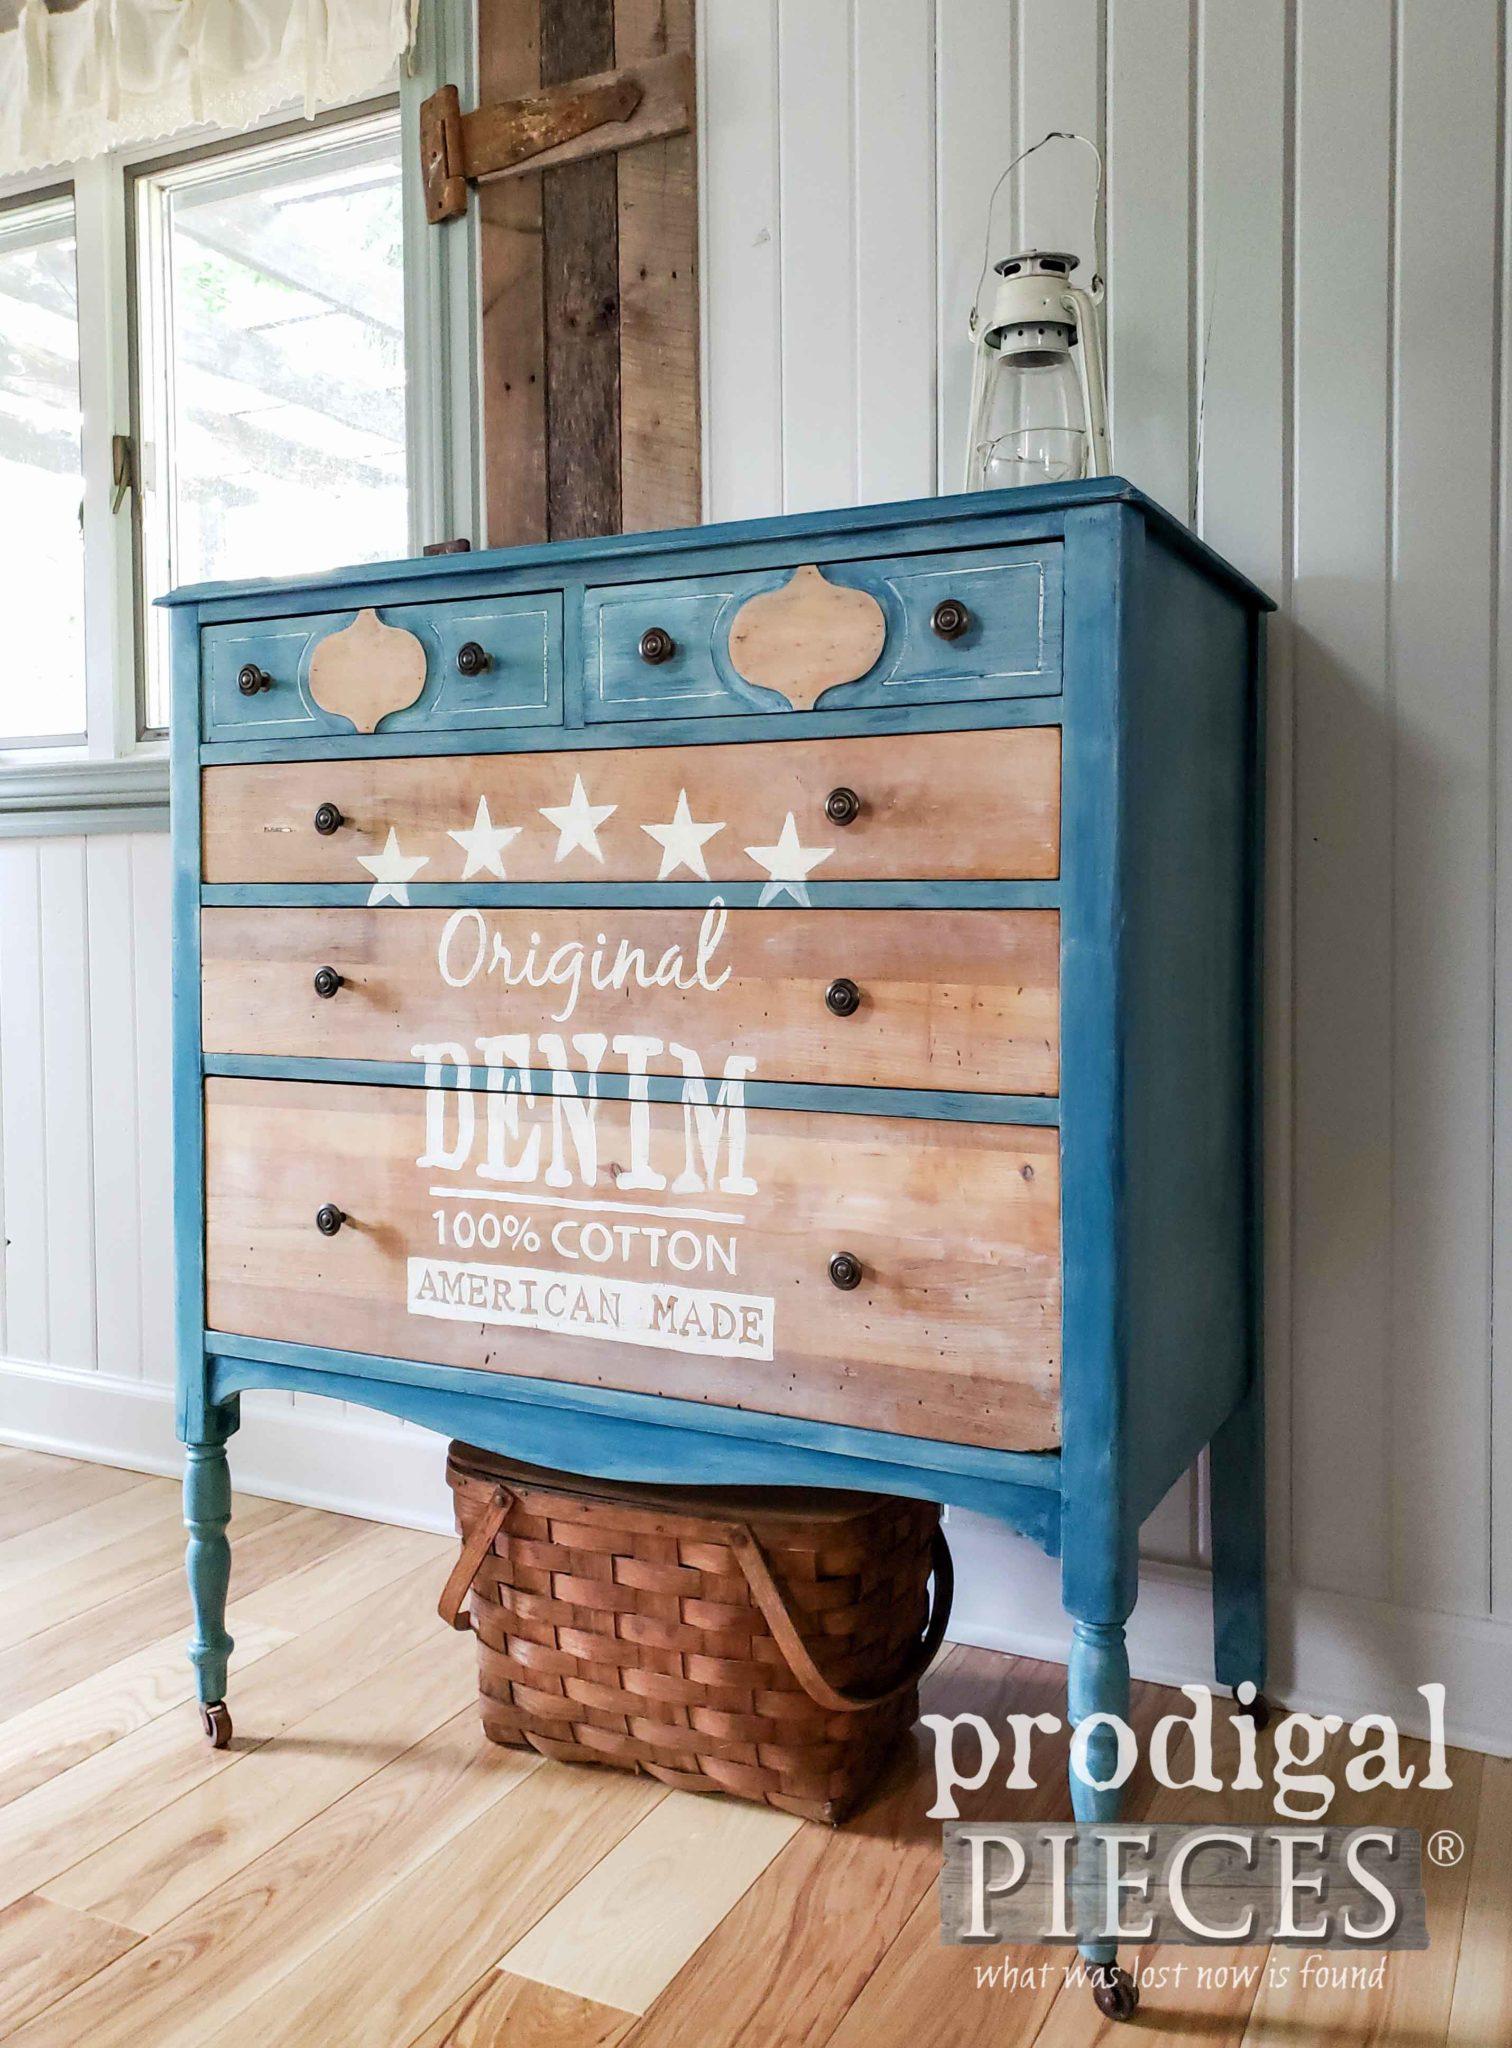 DIY Denim Furniture Paint Technique with Tutorial by Larissa of Prodigal Pieces | prodigalpieces.com #prodigalpieces #diy #farmhouse #furniture #home #homedecor #denim